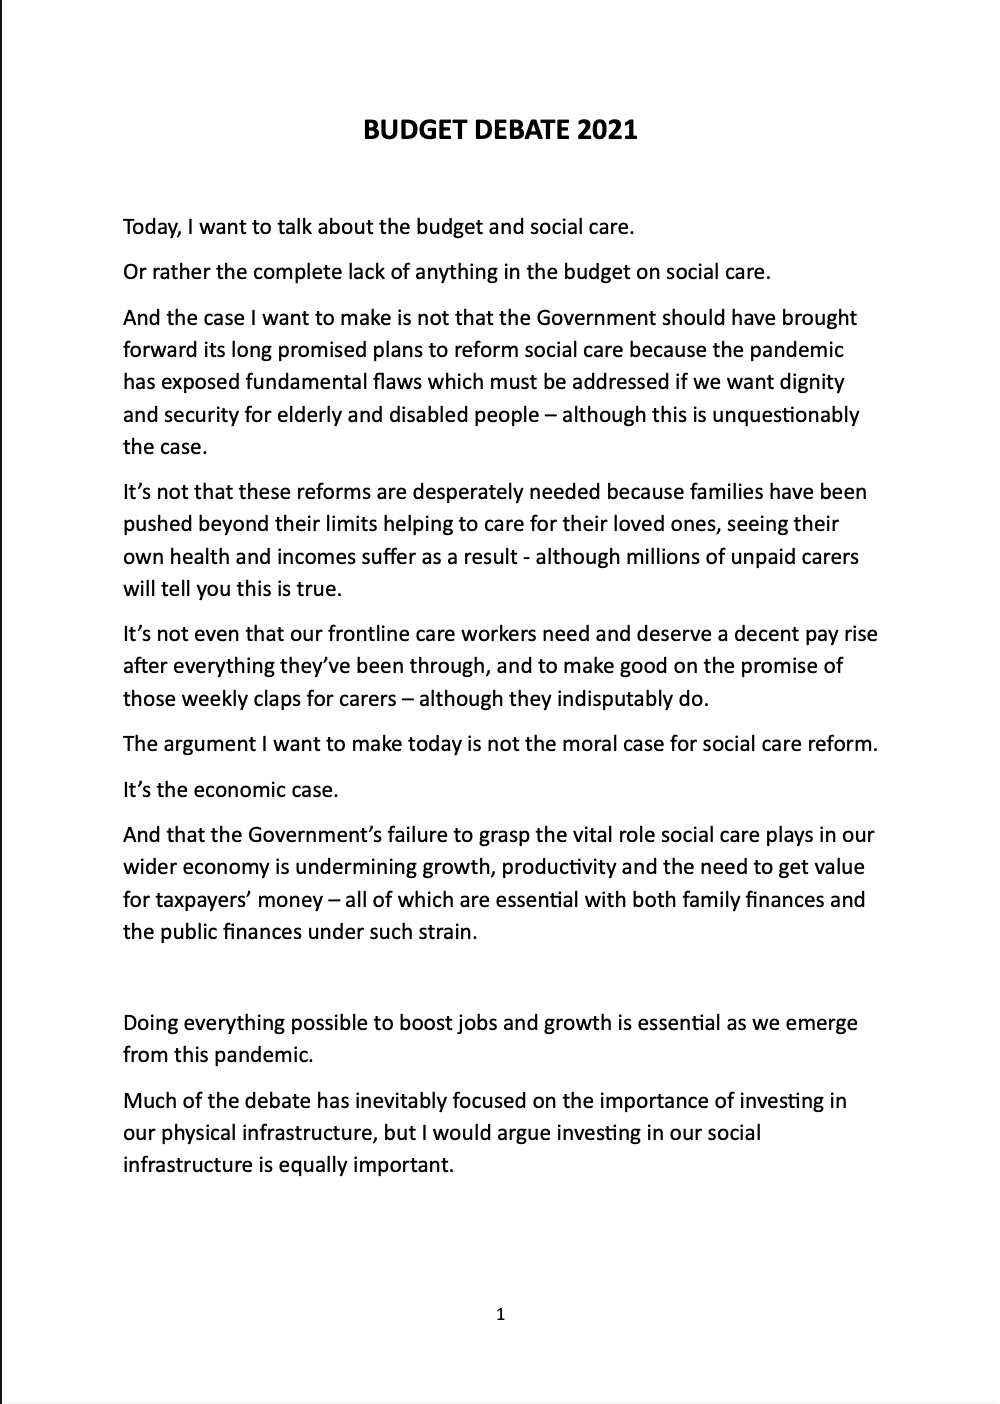 Budget Debate 2021 Speech - Page 1